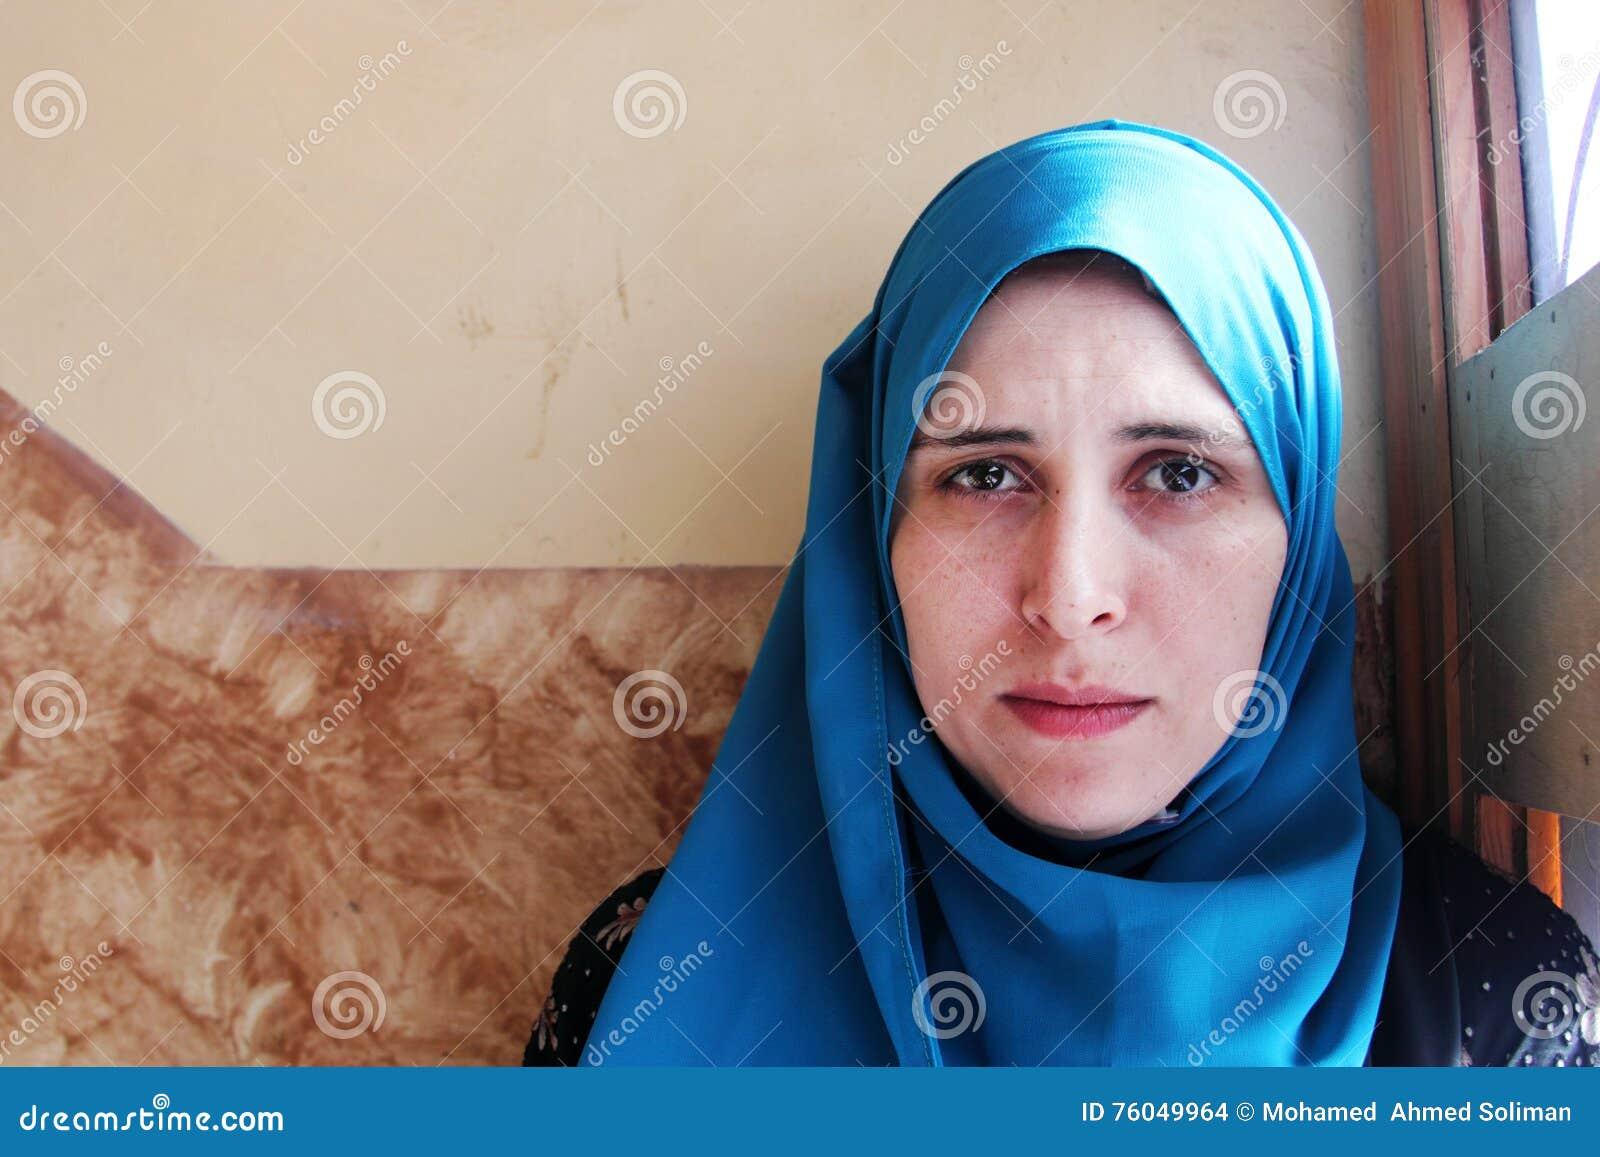 Crying arab muslim woman